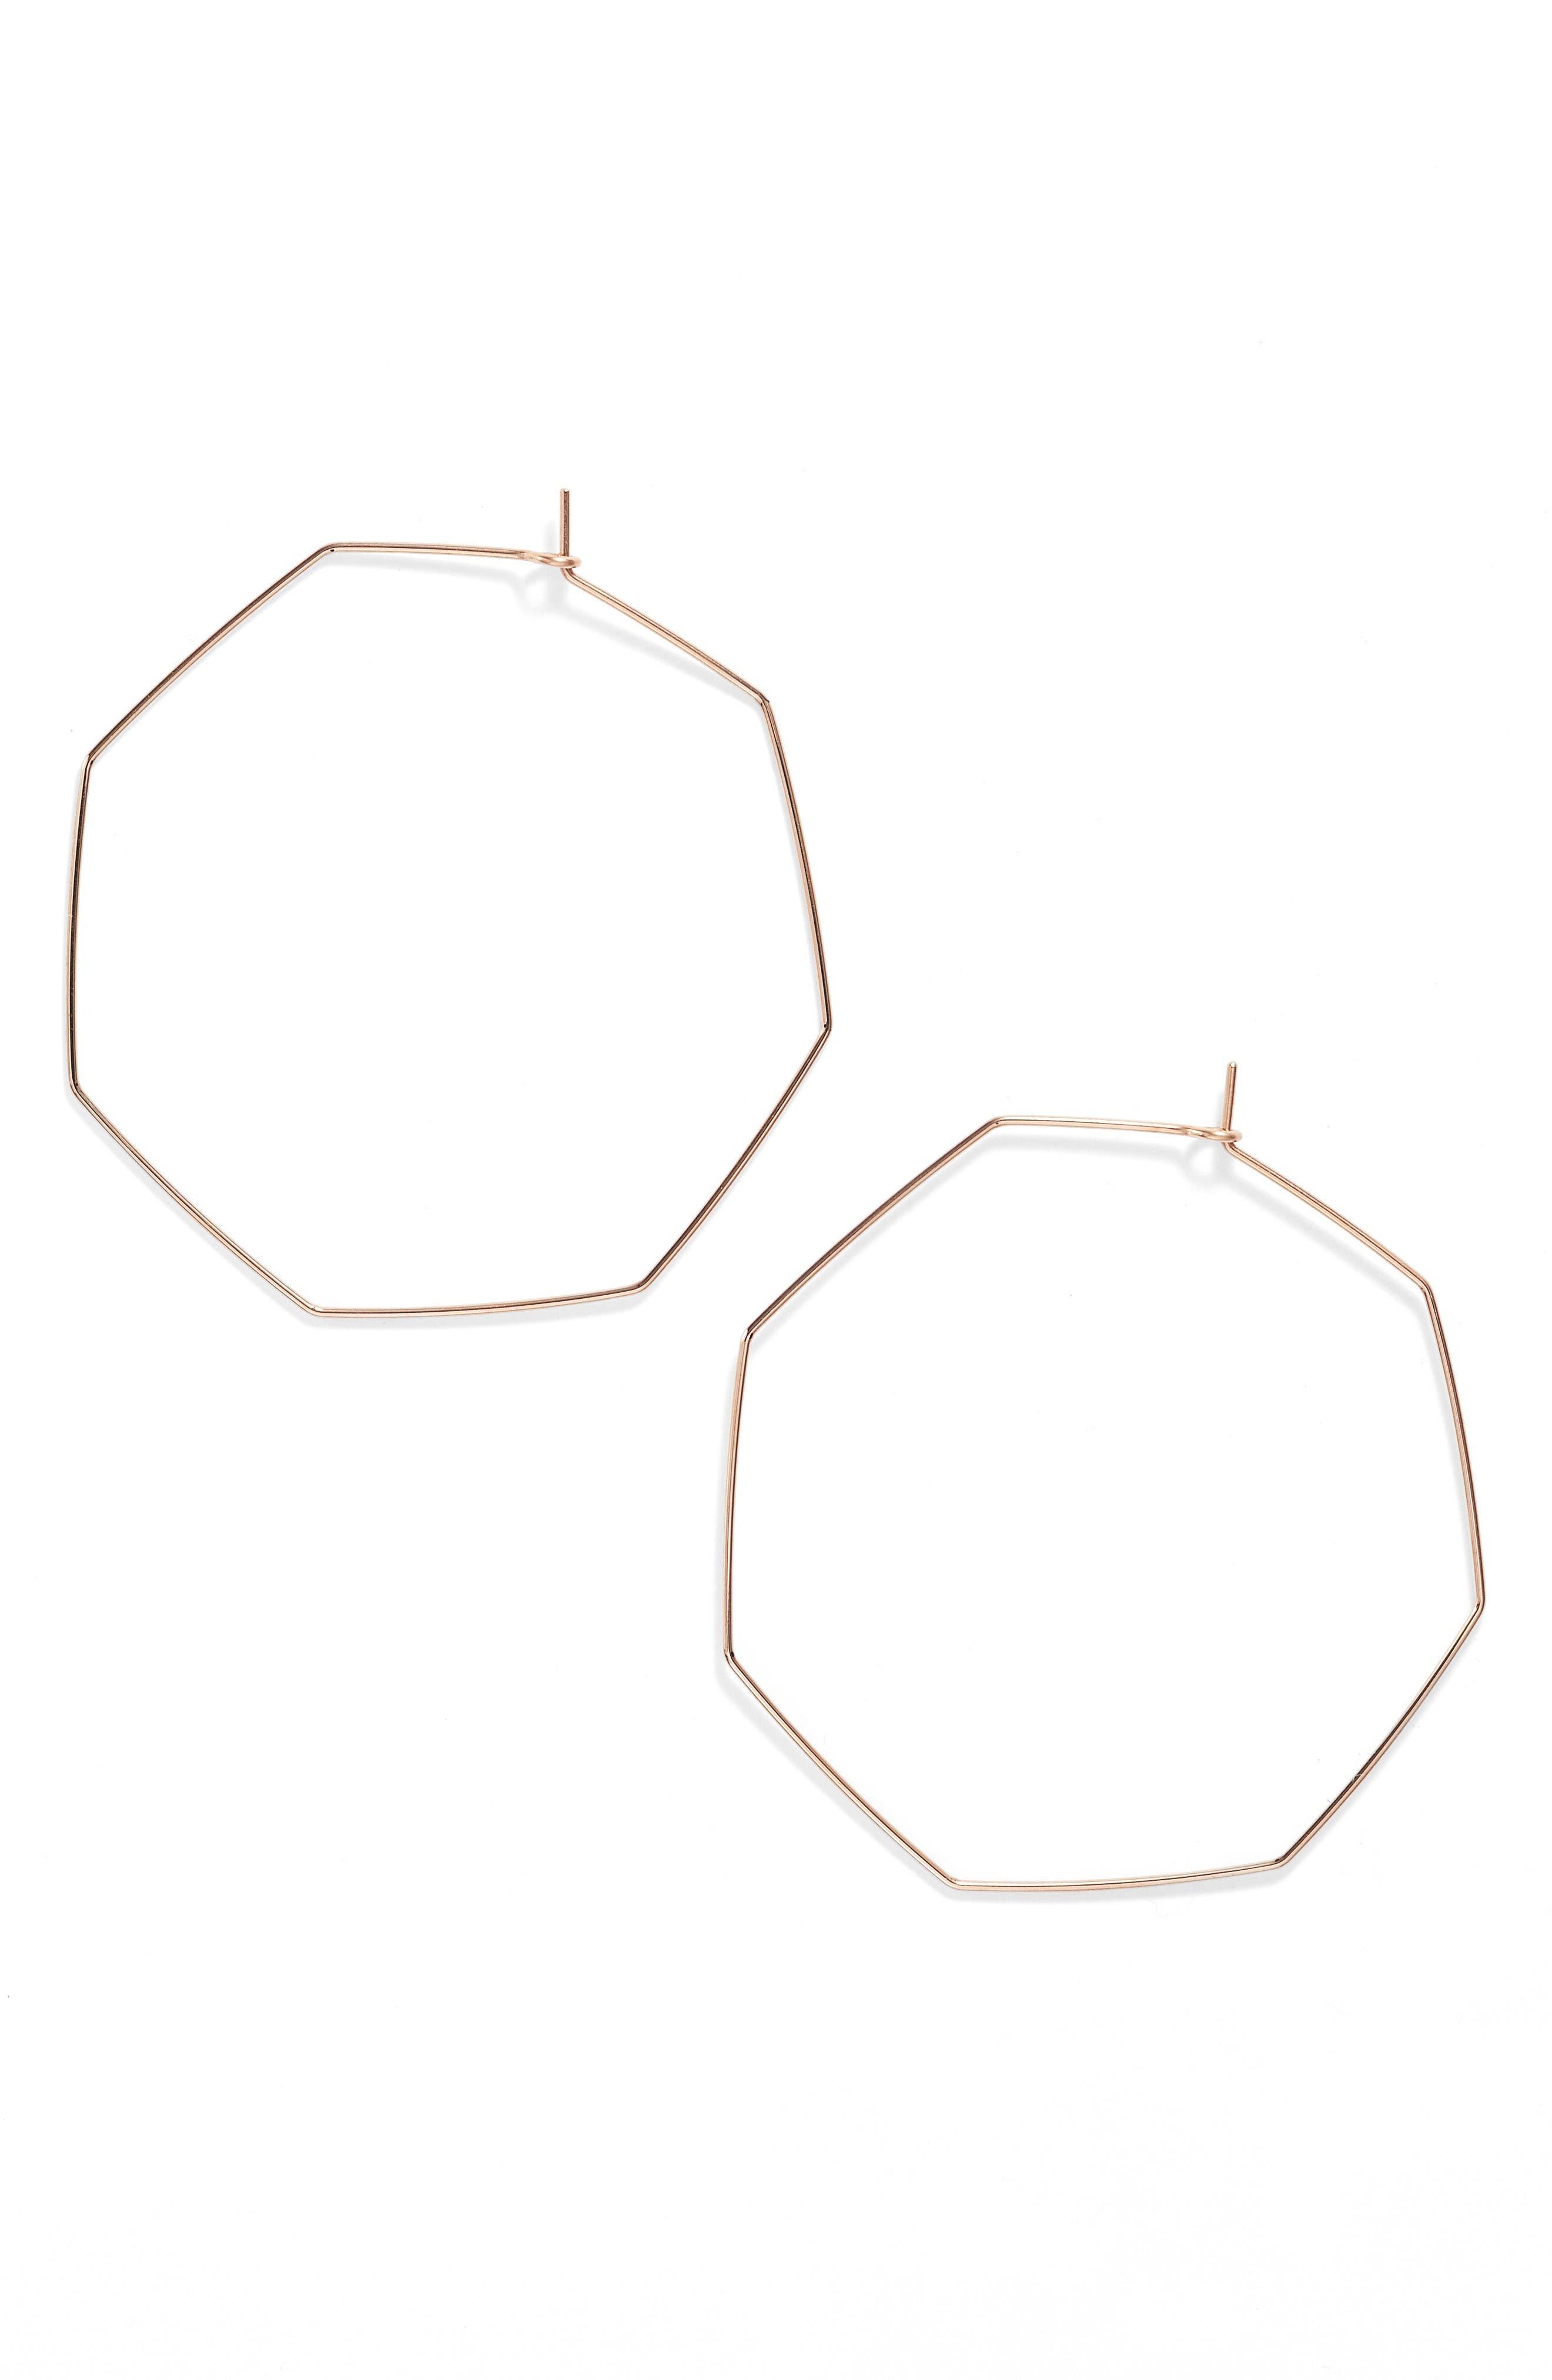 Nashelle Octagon Hoop Earrings